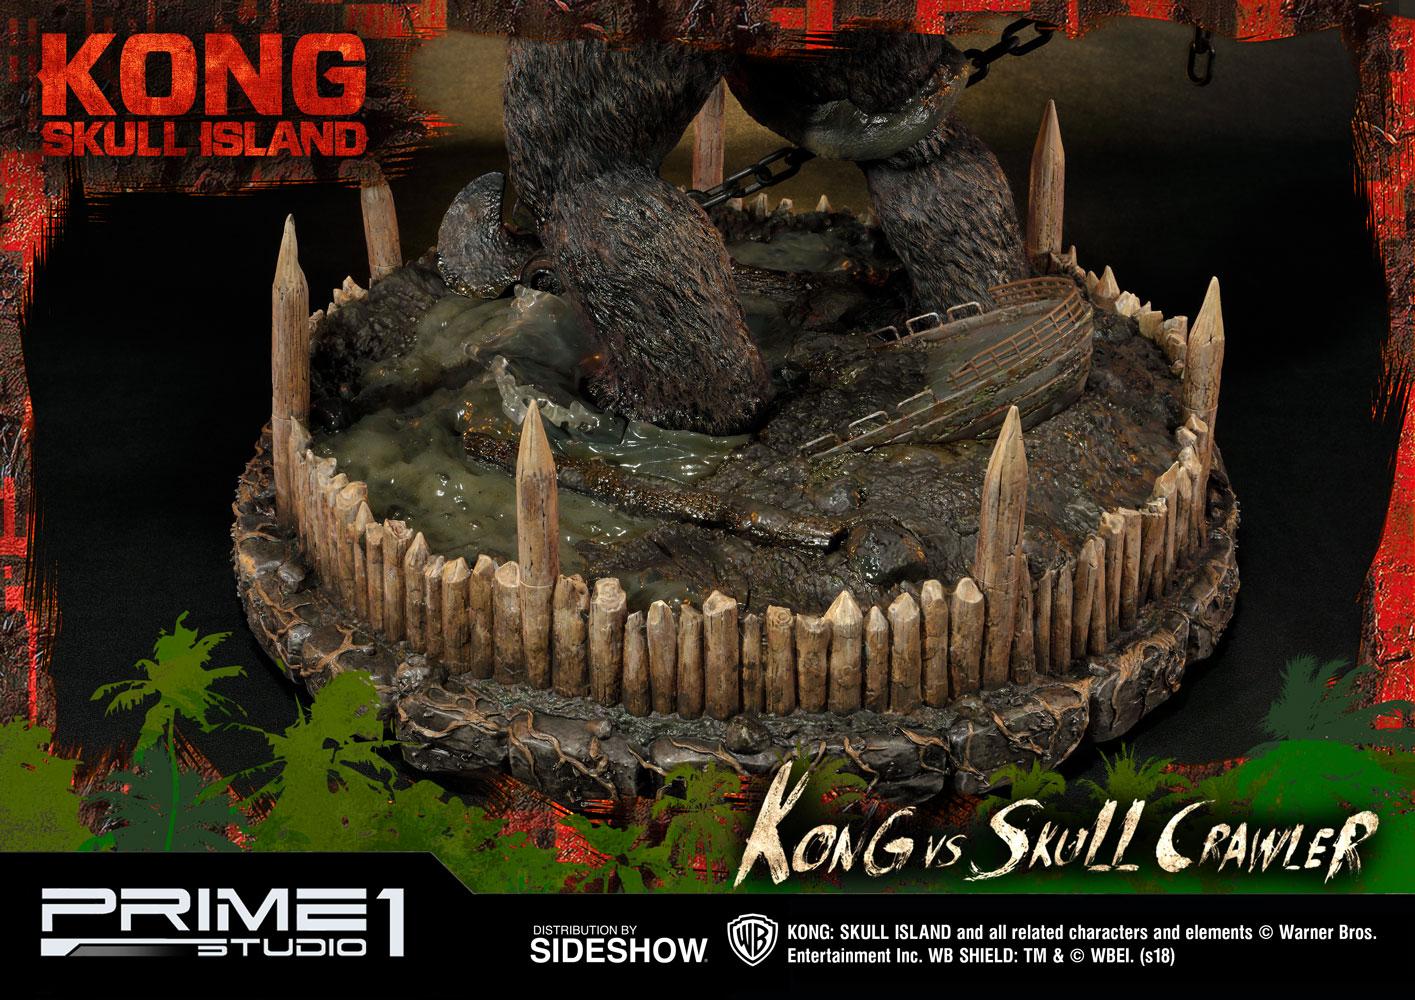 kong skull island free download full hd